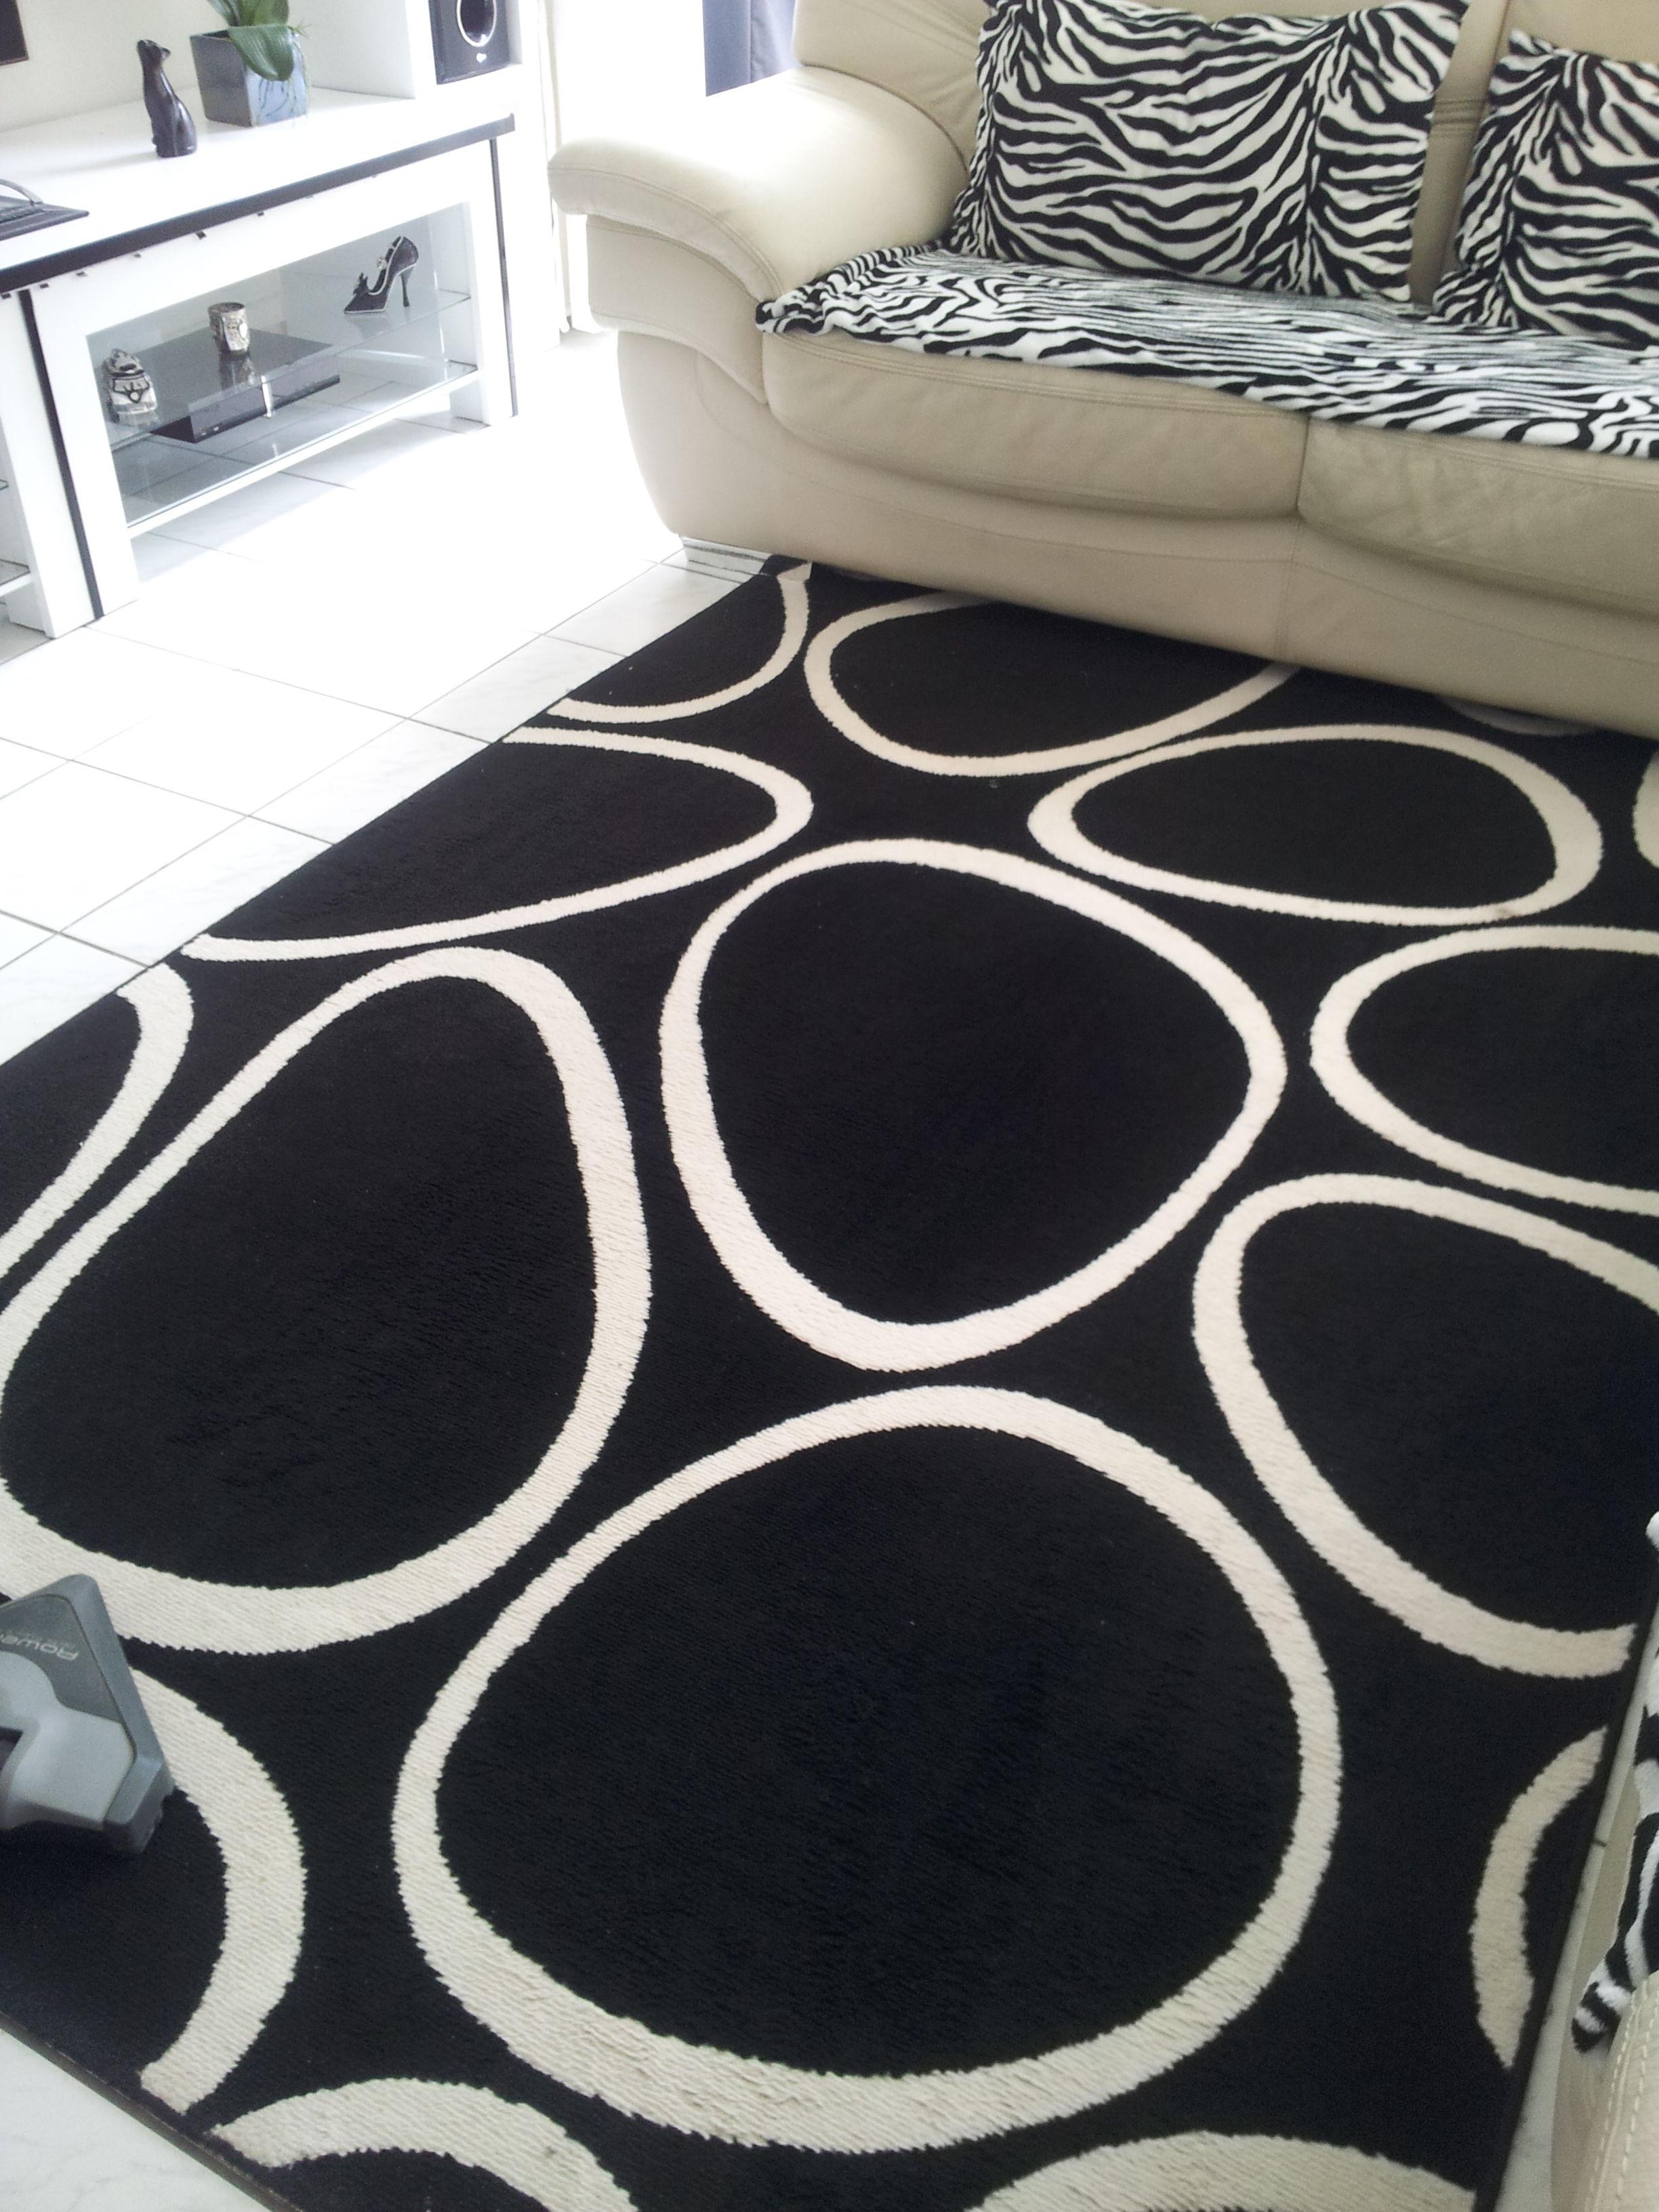 tapis noir et blanc desing dcoration - Tapis Noir Et Blanc